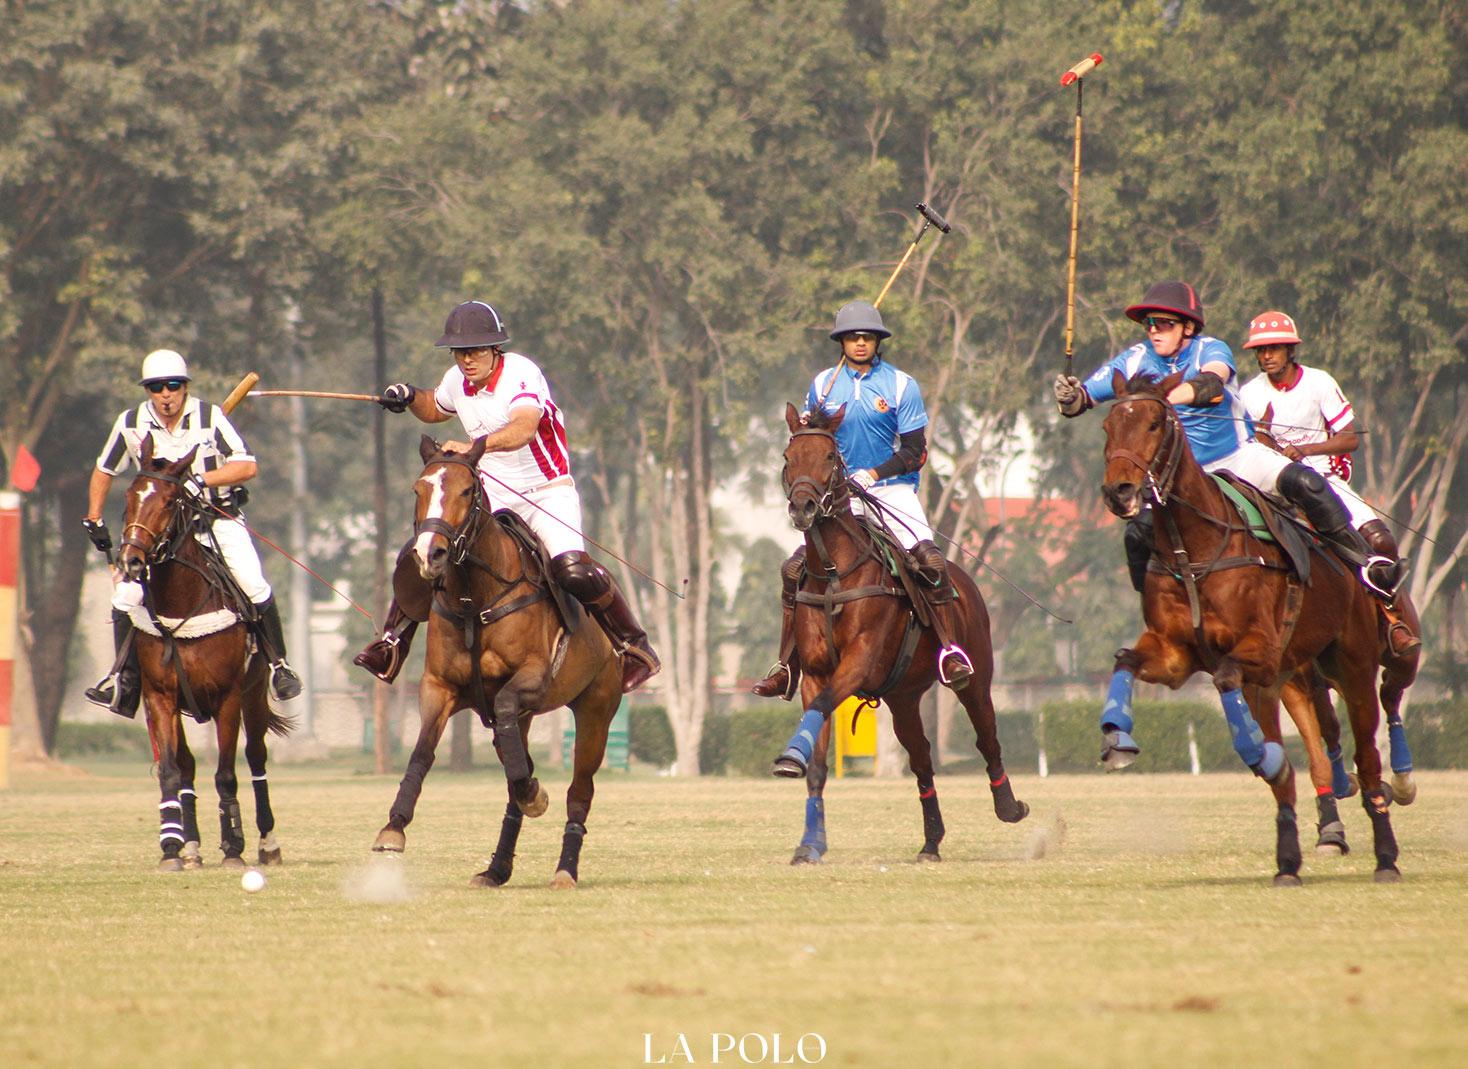 team-jindal-team-rajnigandha-achievers-lapolo